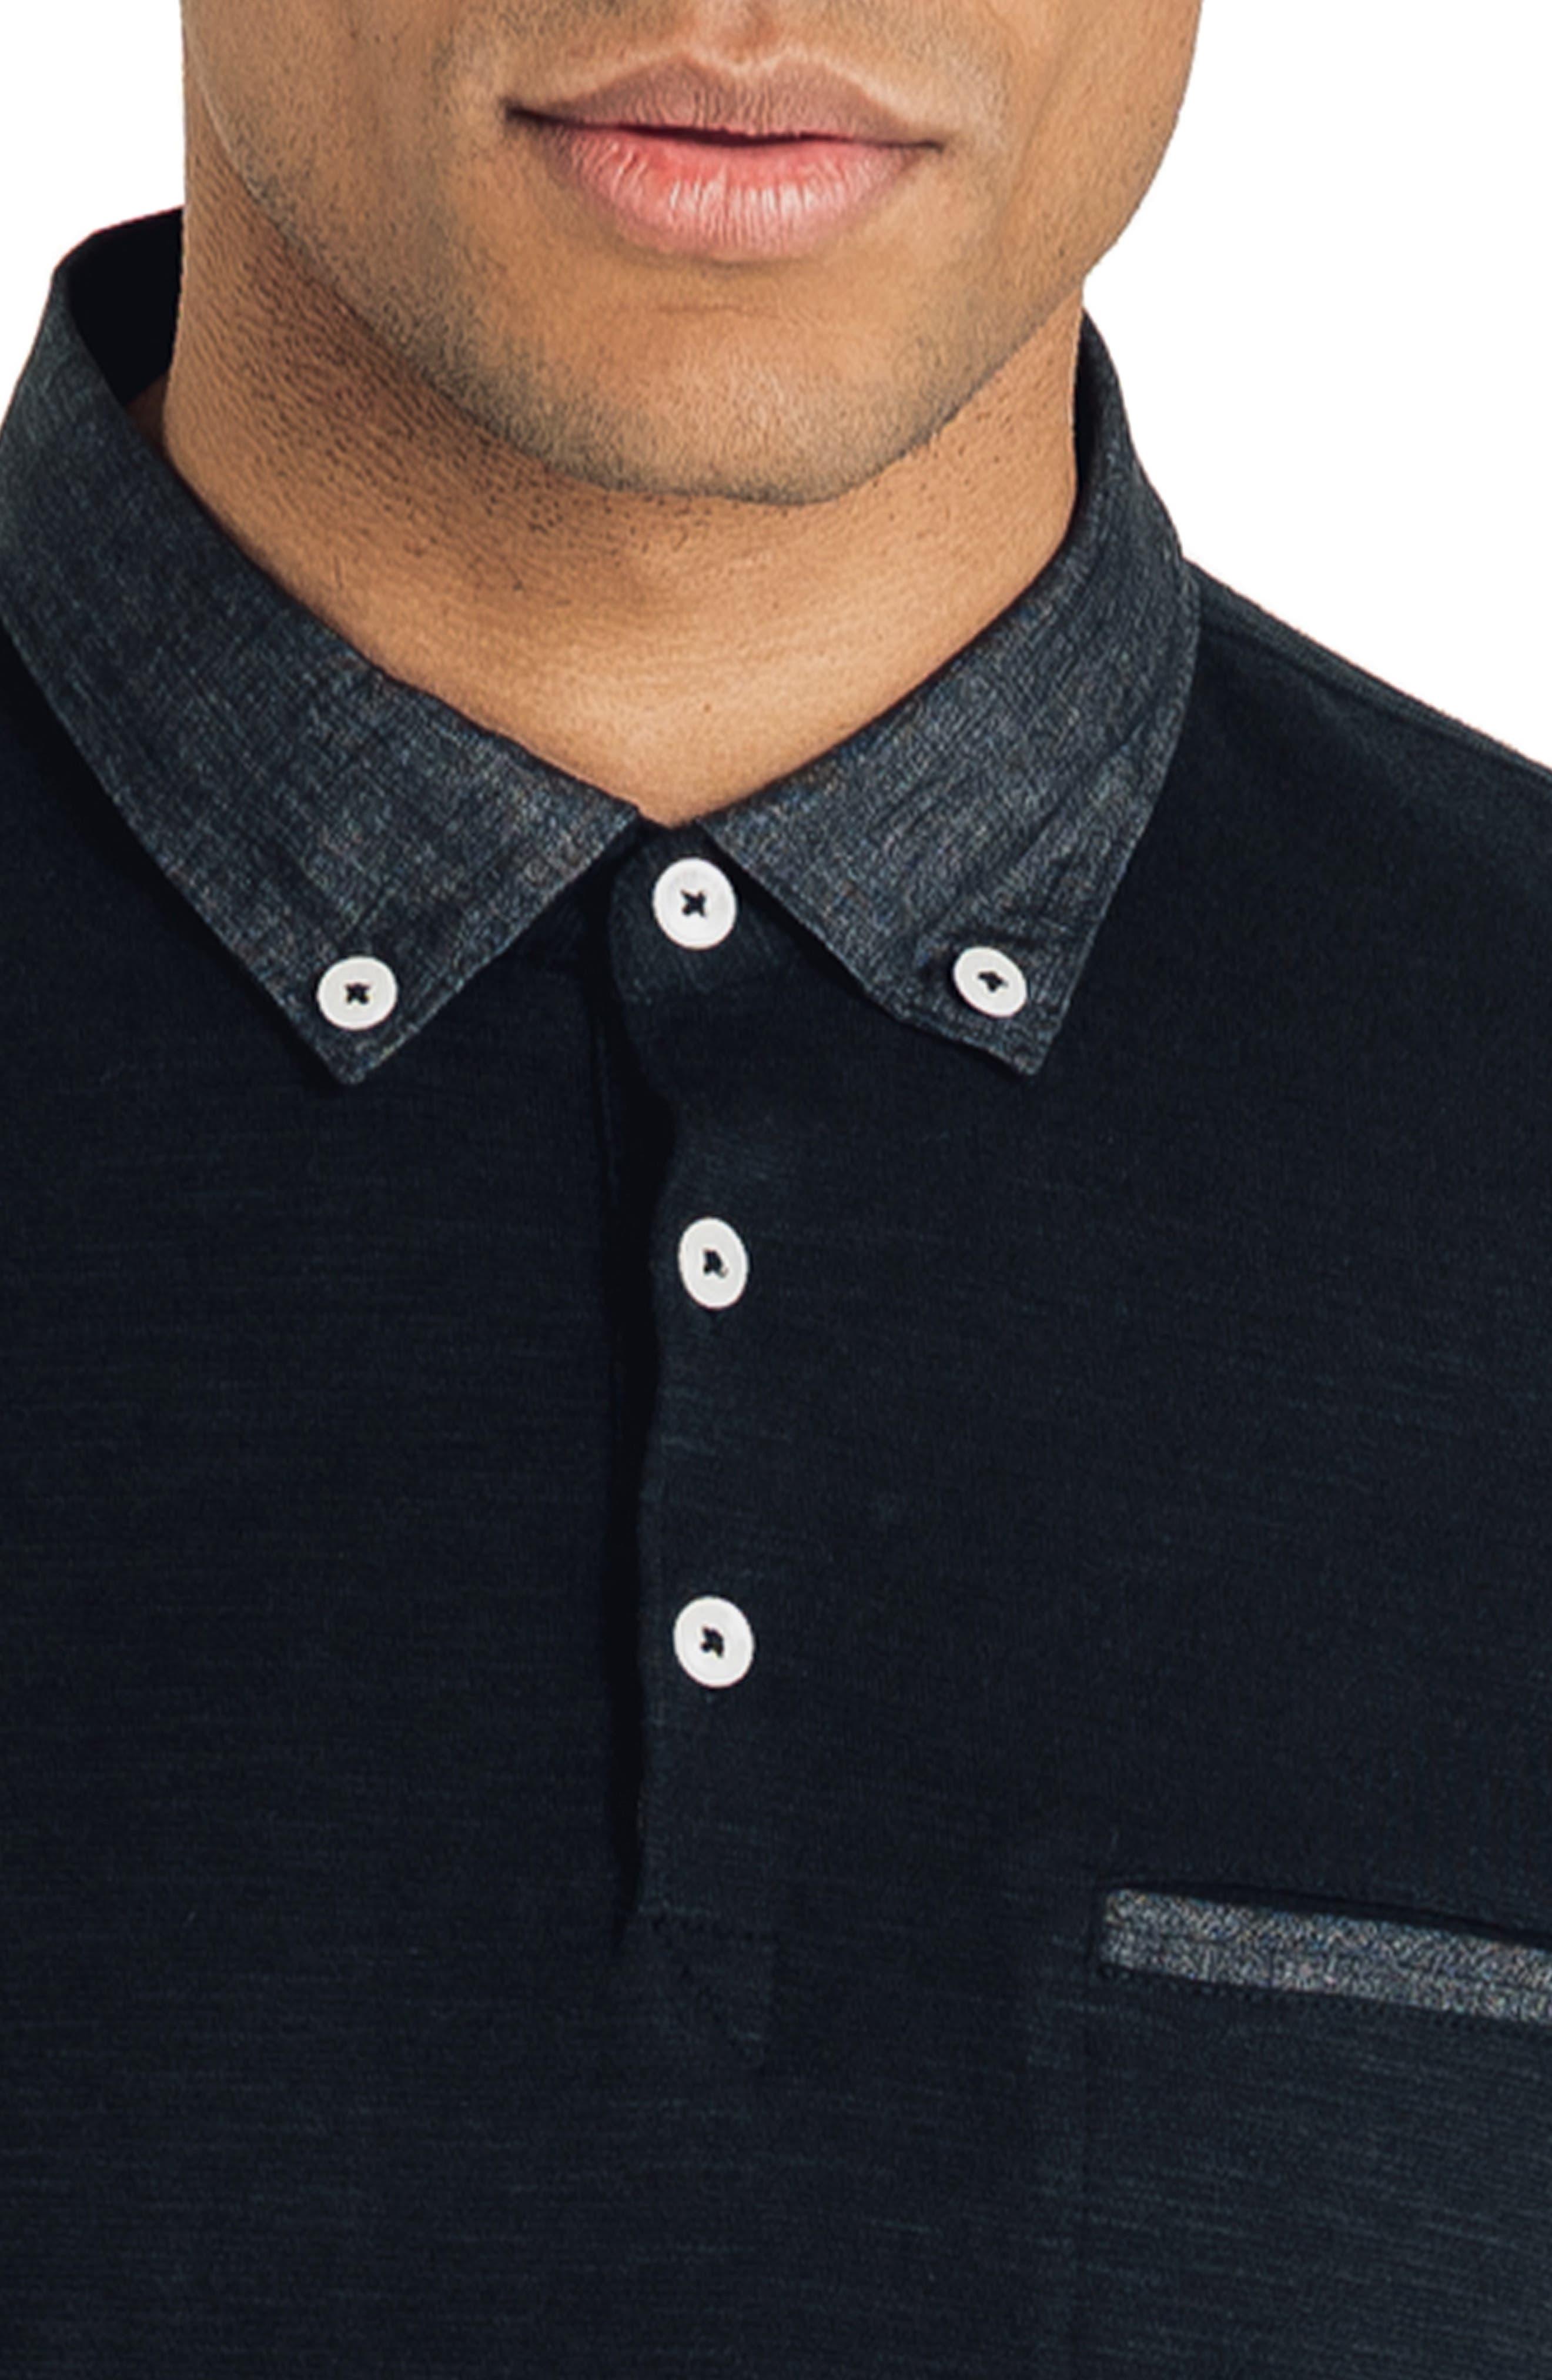 GOOD MAN BRAND, Slub Jersey Cotton Polo Shirt, Alternate thumbnail 4, color, BLACK